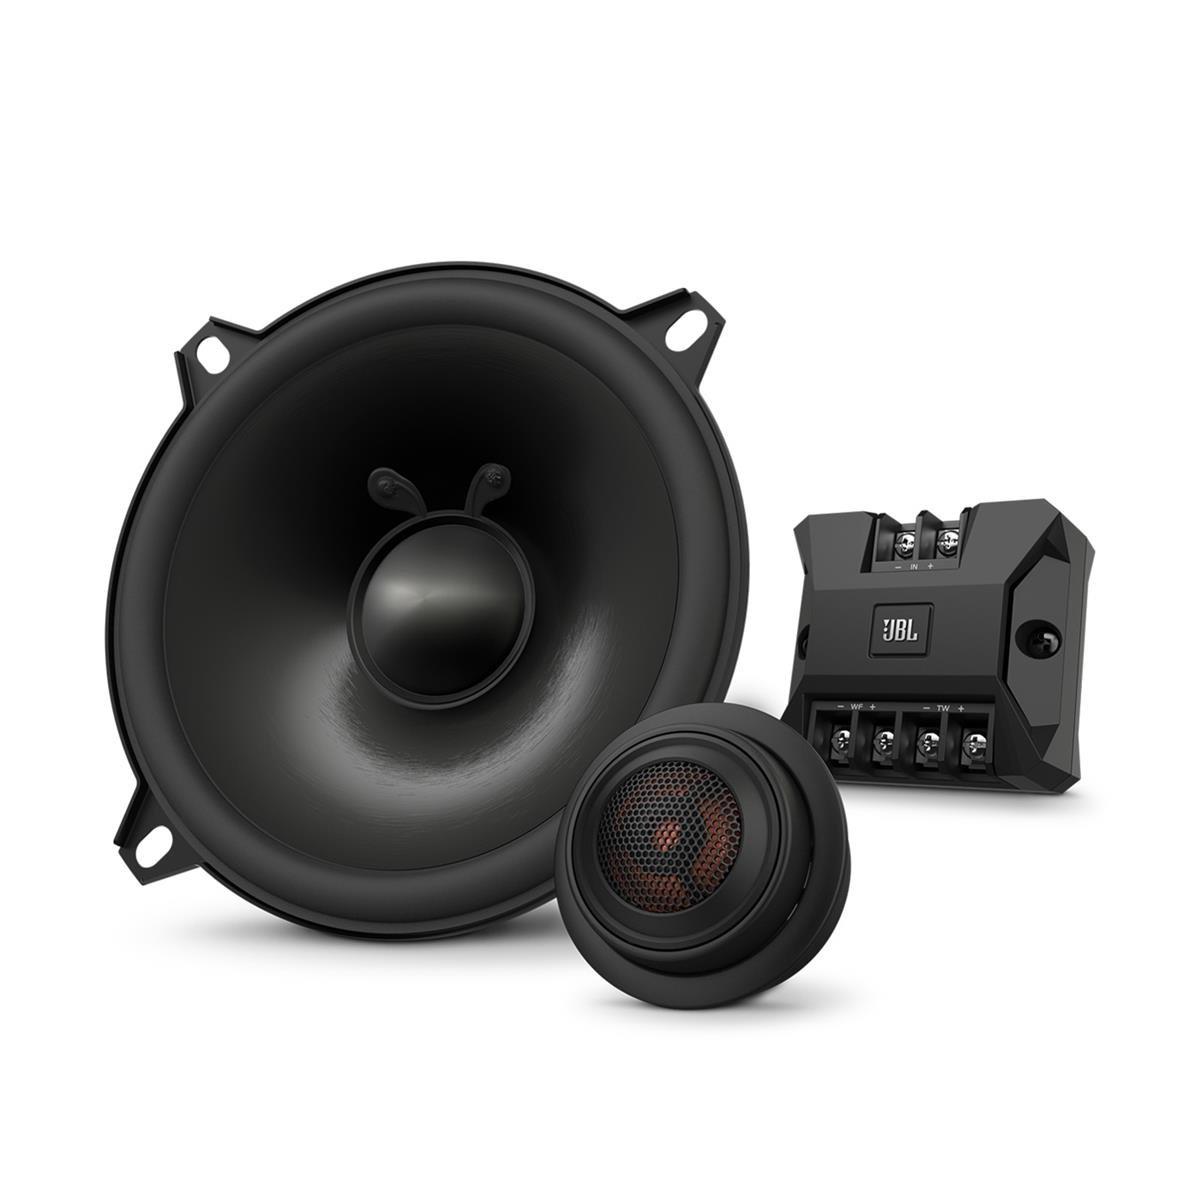 JBL Club 5000C 330W Peak 5-1/4'' Club Series 2-Way Component Car Speakers